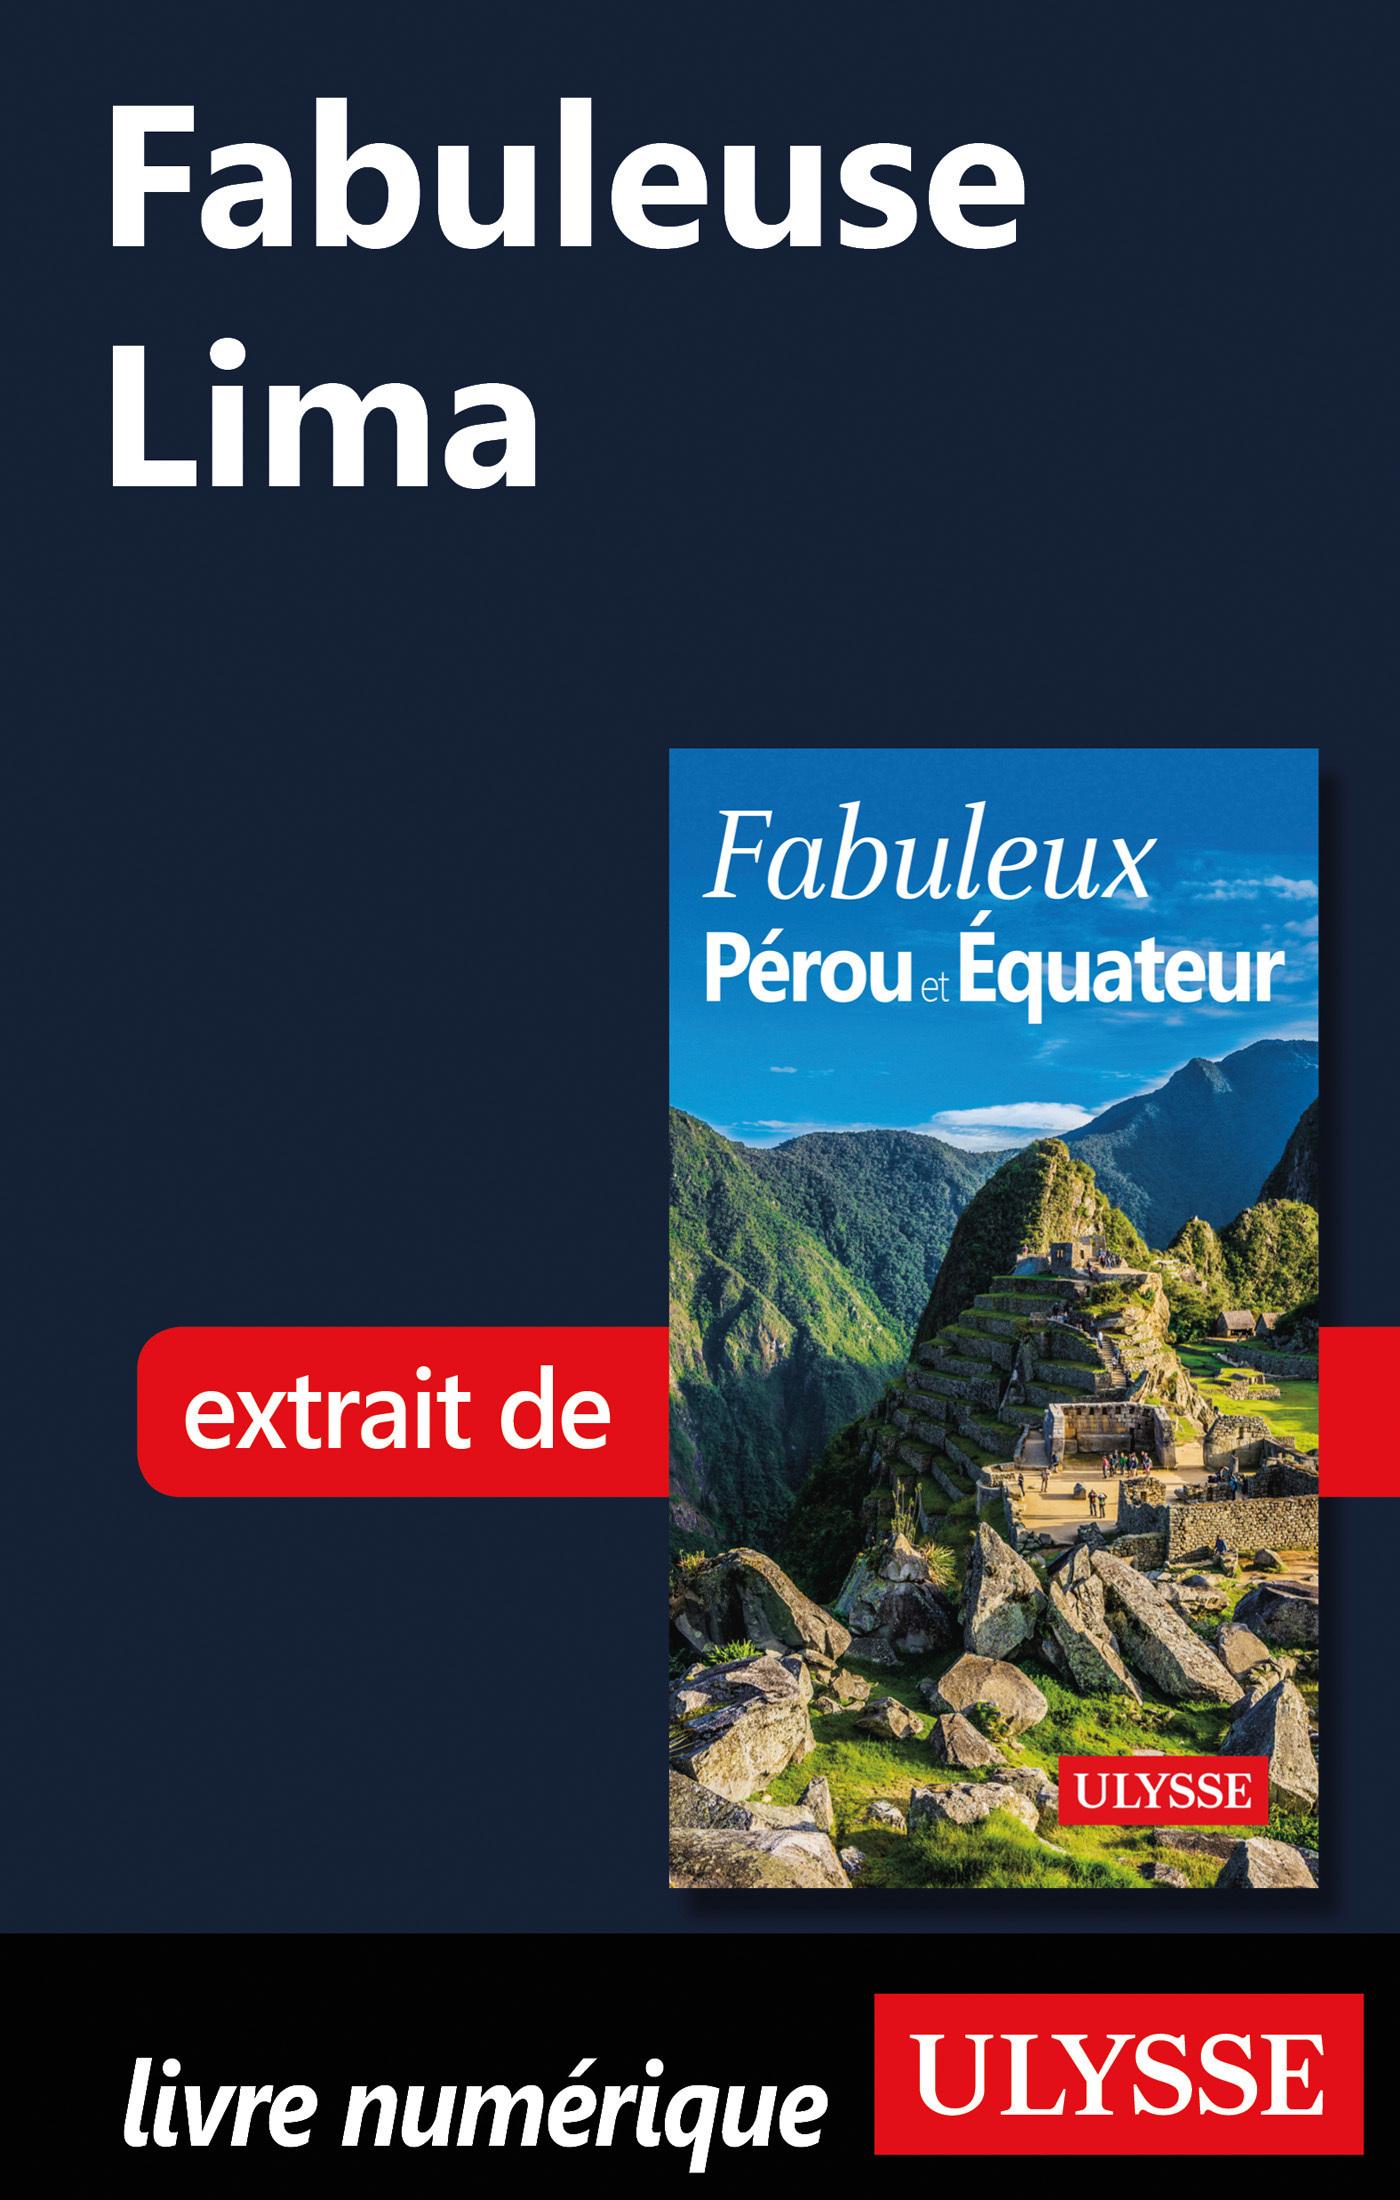 Fabuleuse Lima